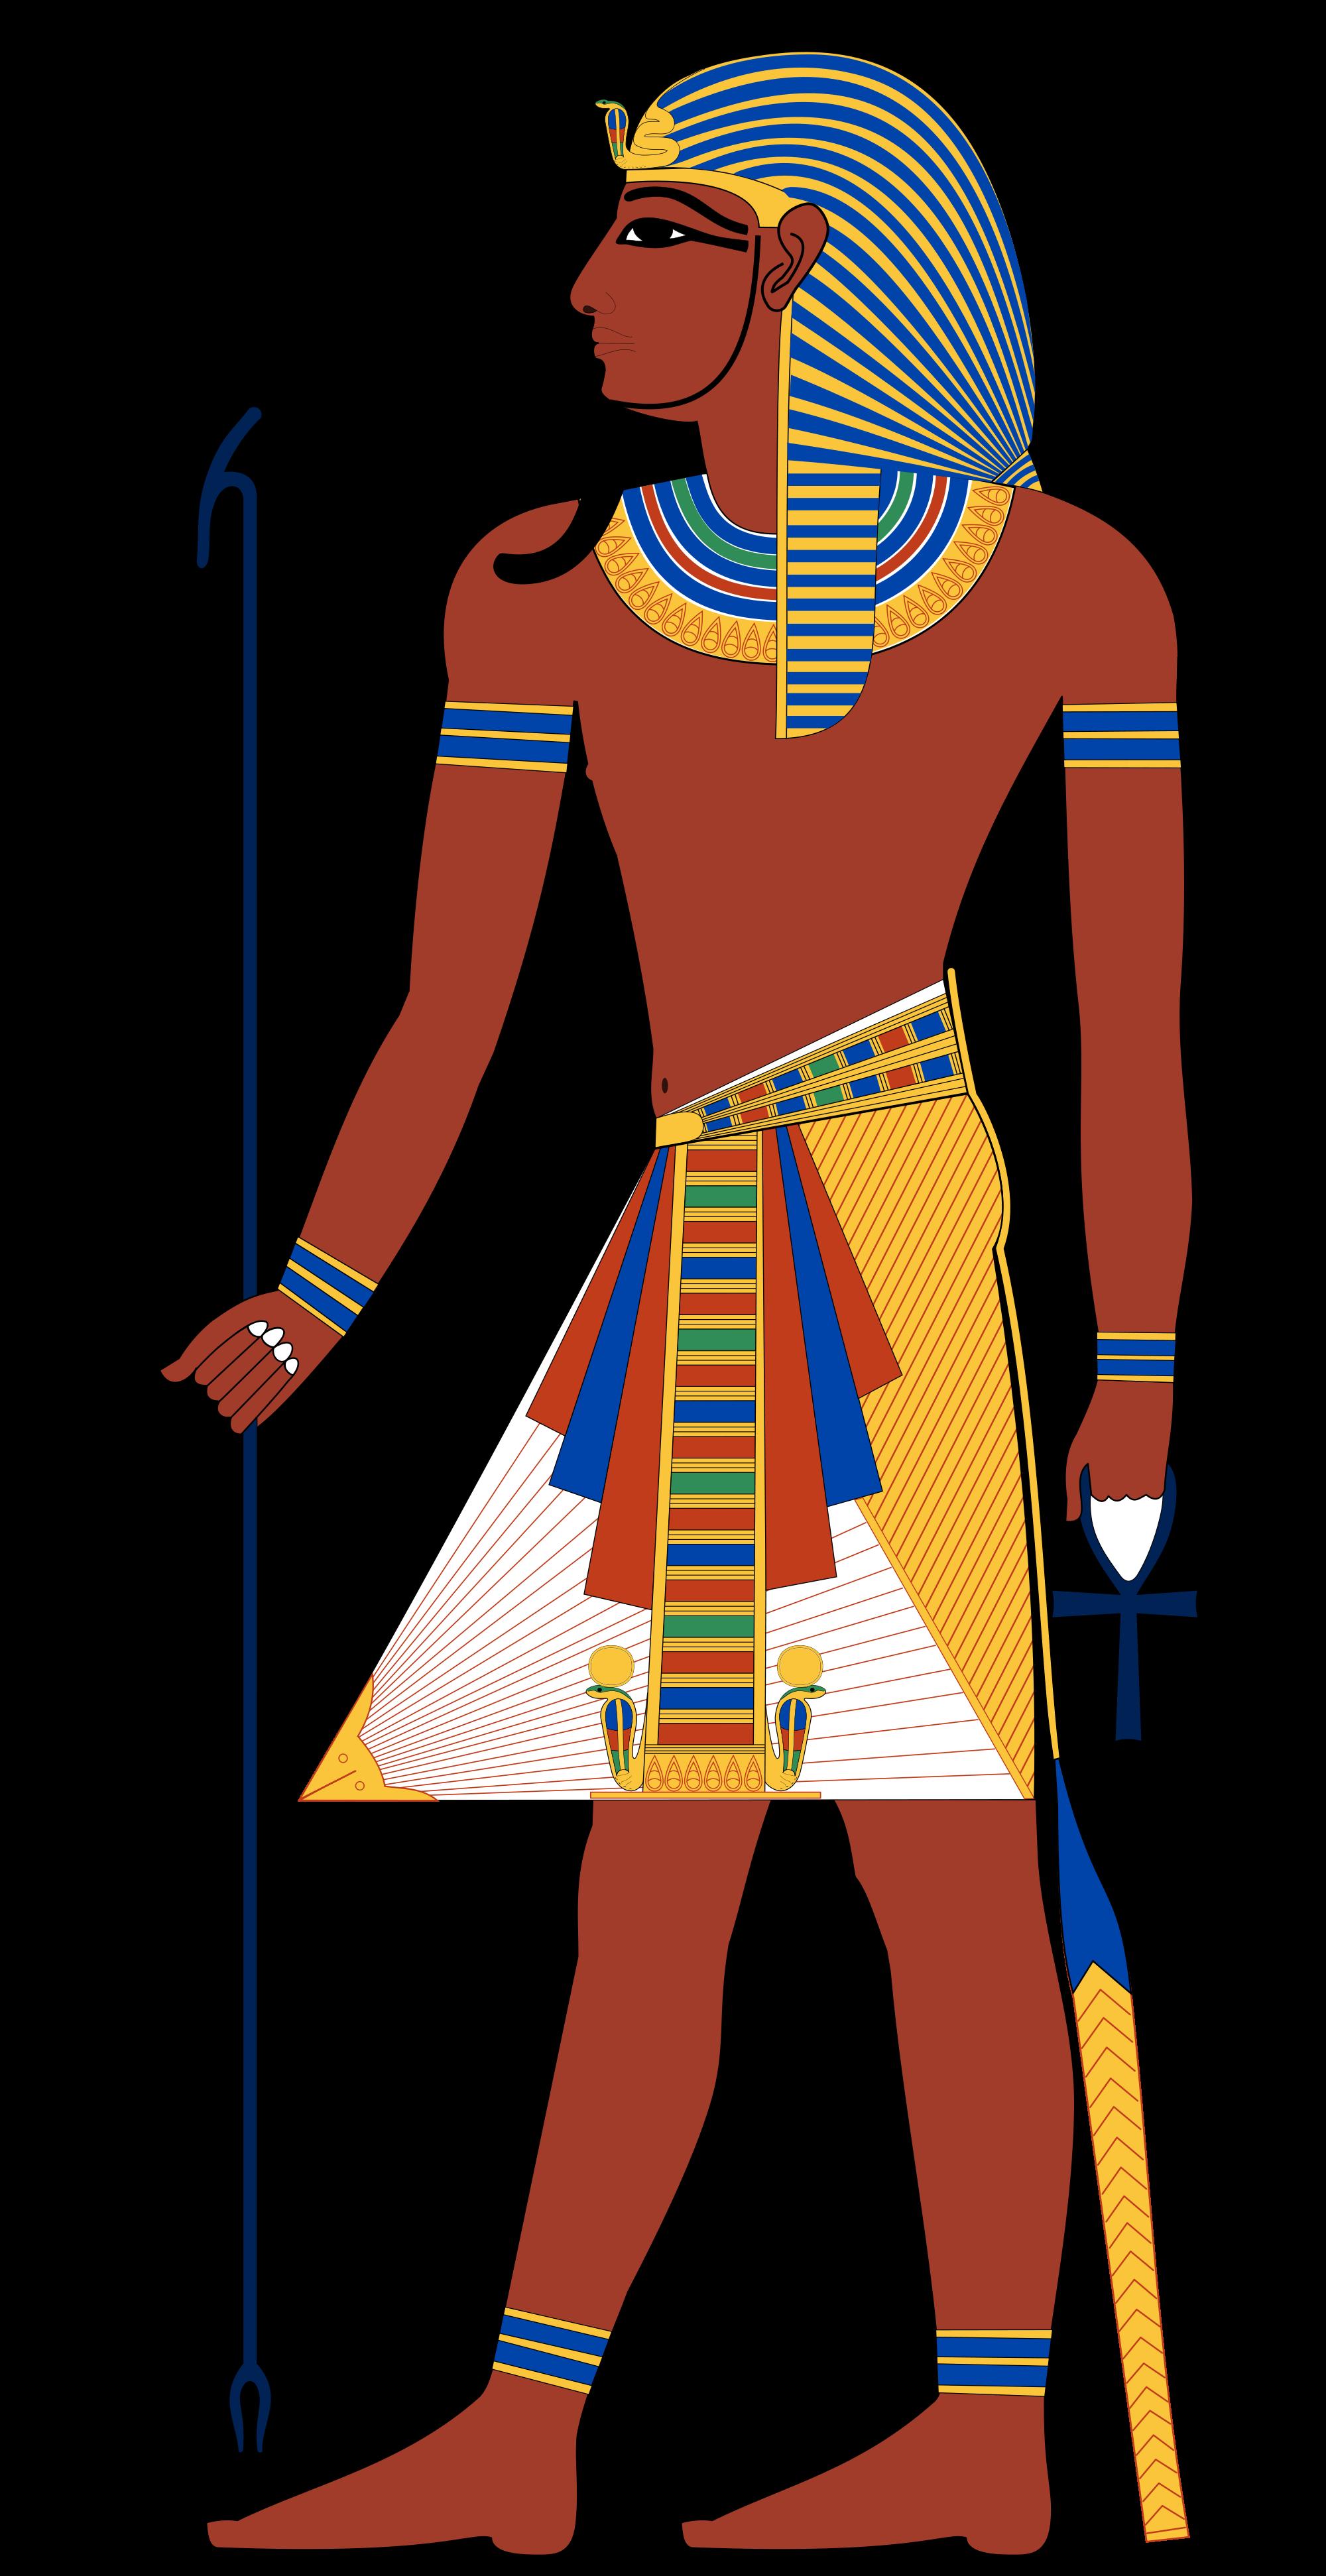 Ankh clipart ancient civilization Playbuzz  Egyptian Quiz